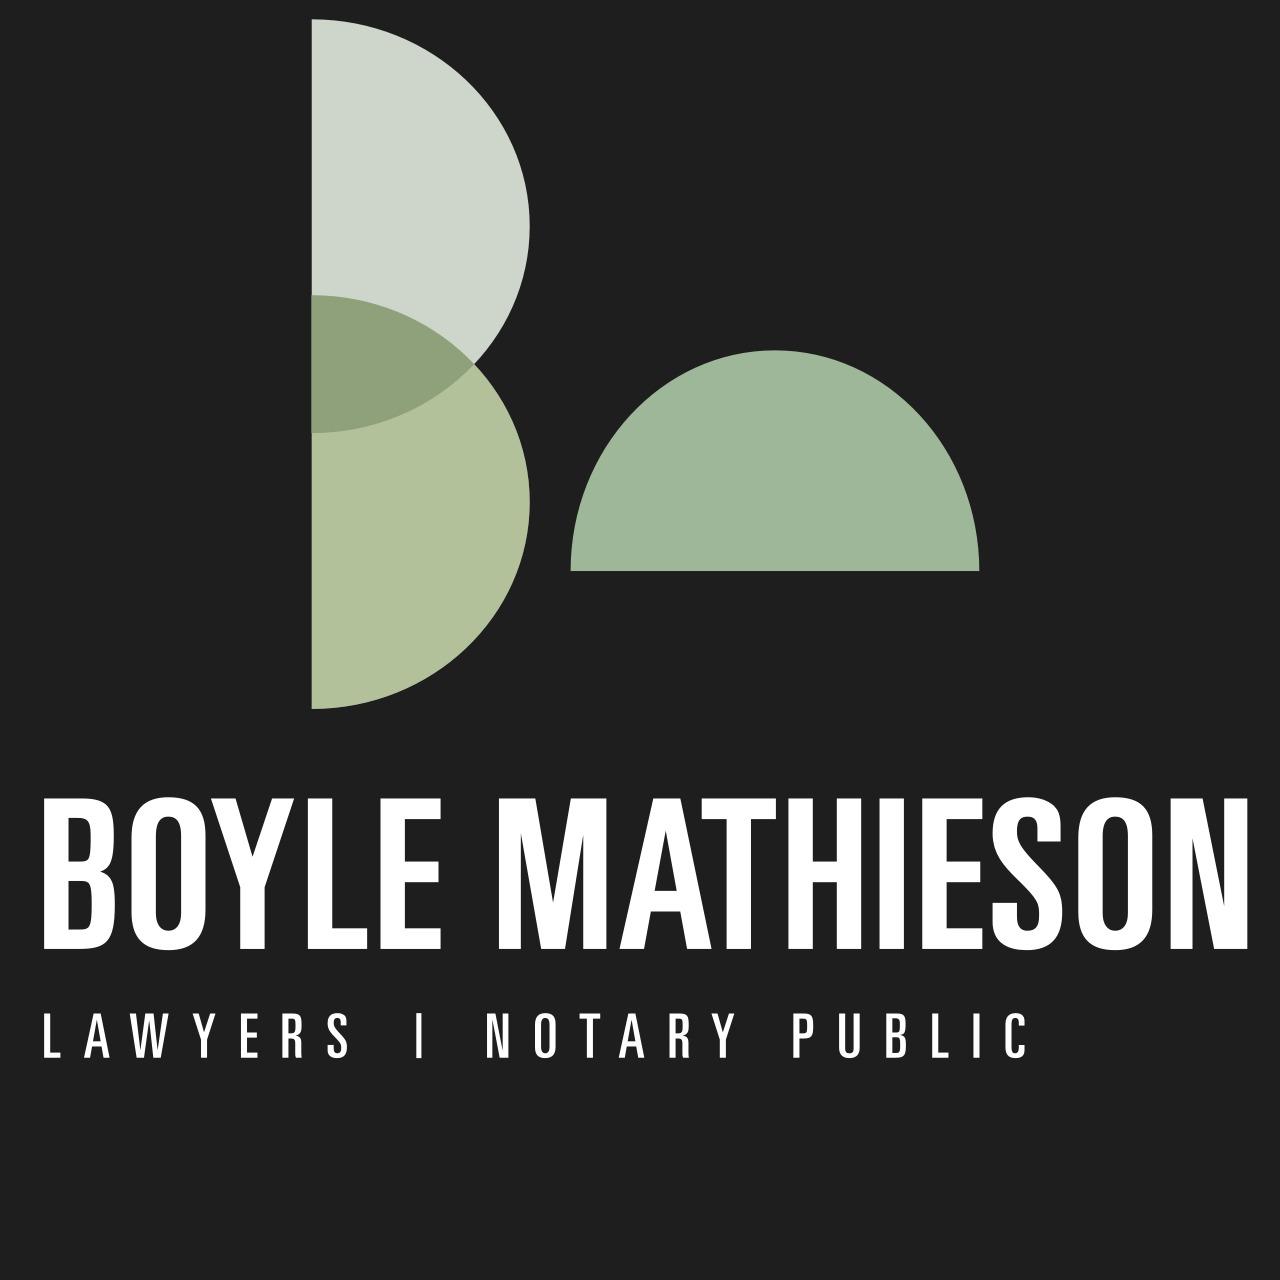 Boyle Mathieson - Fiona Mathieson Notary Public